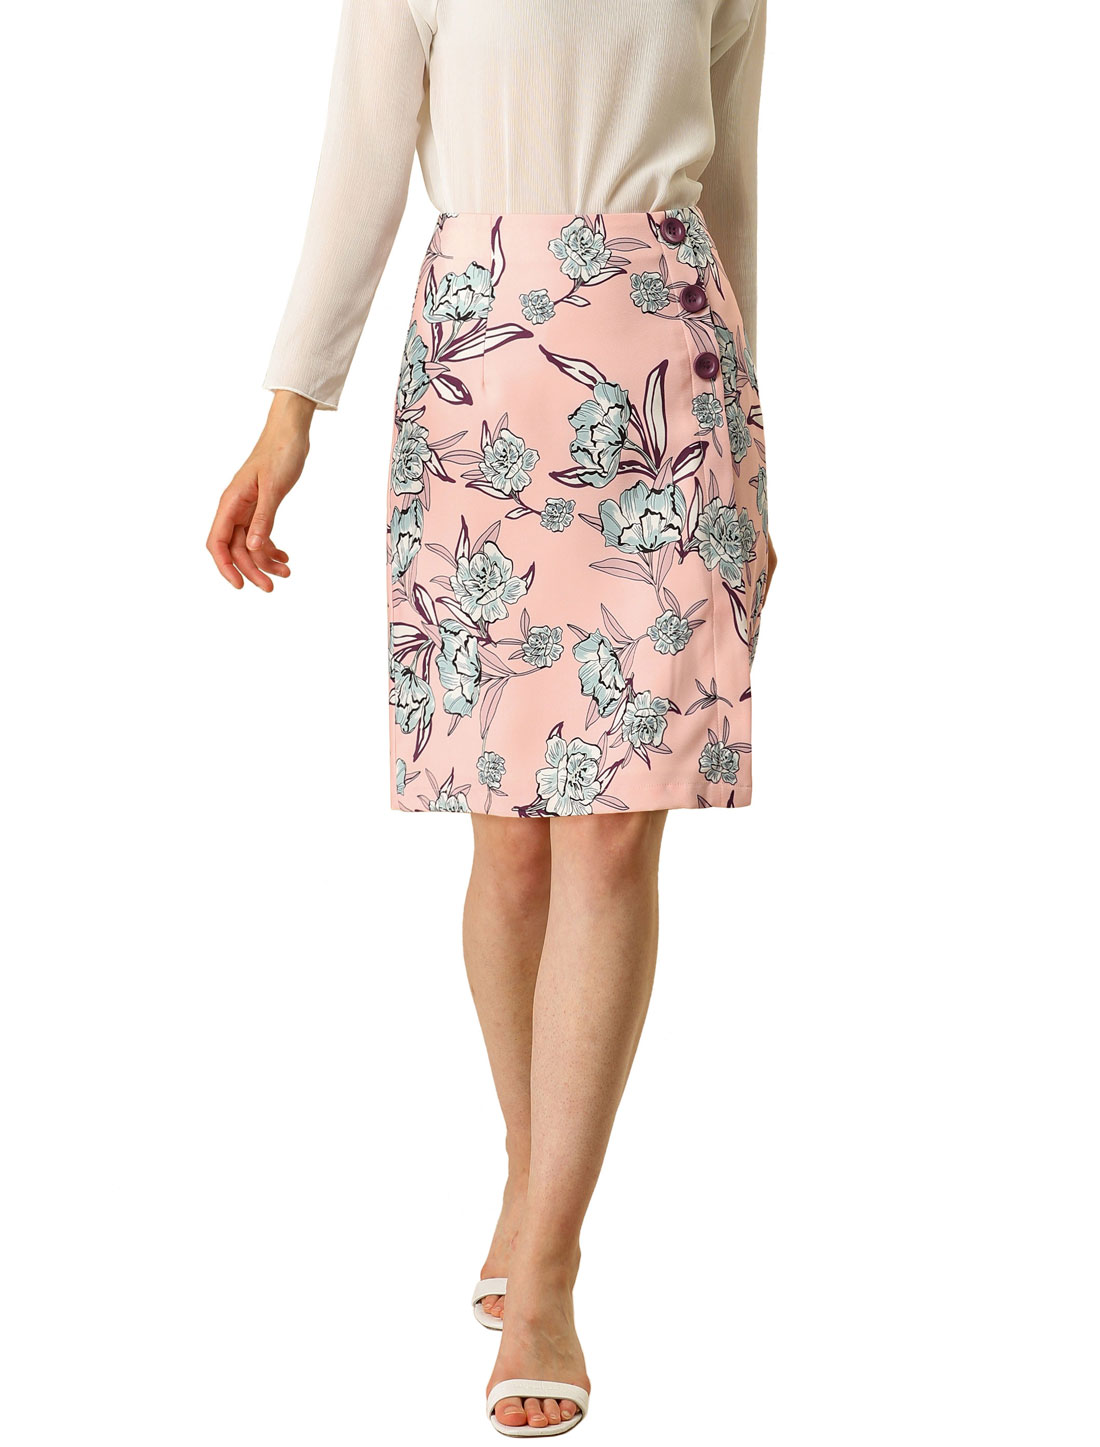 Allegra K Women's Work Elegant Floral Button Decor High Waist Skirt Pink M